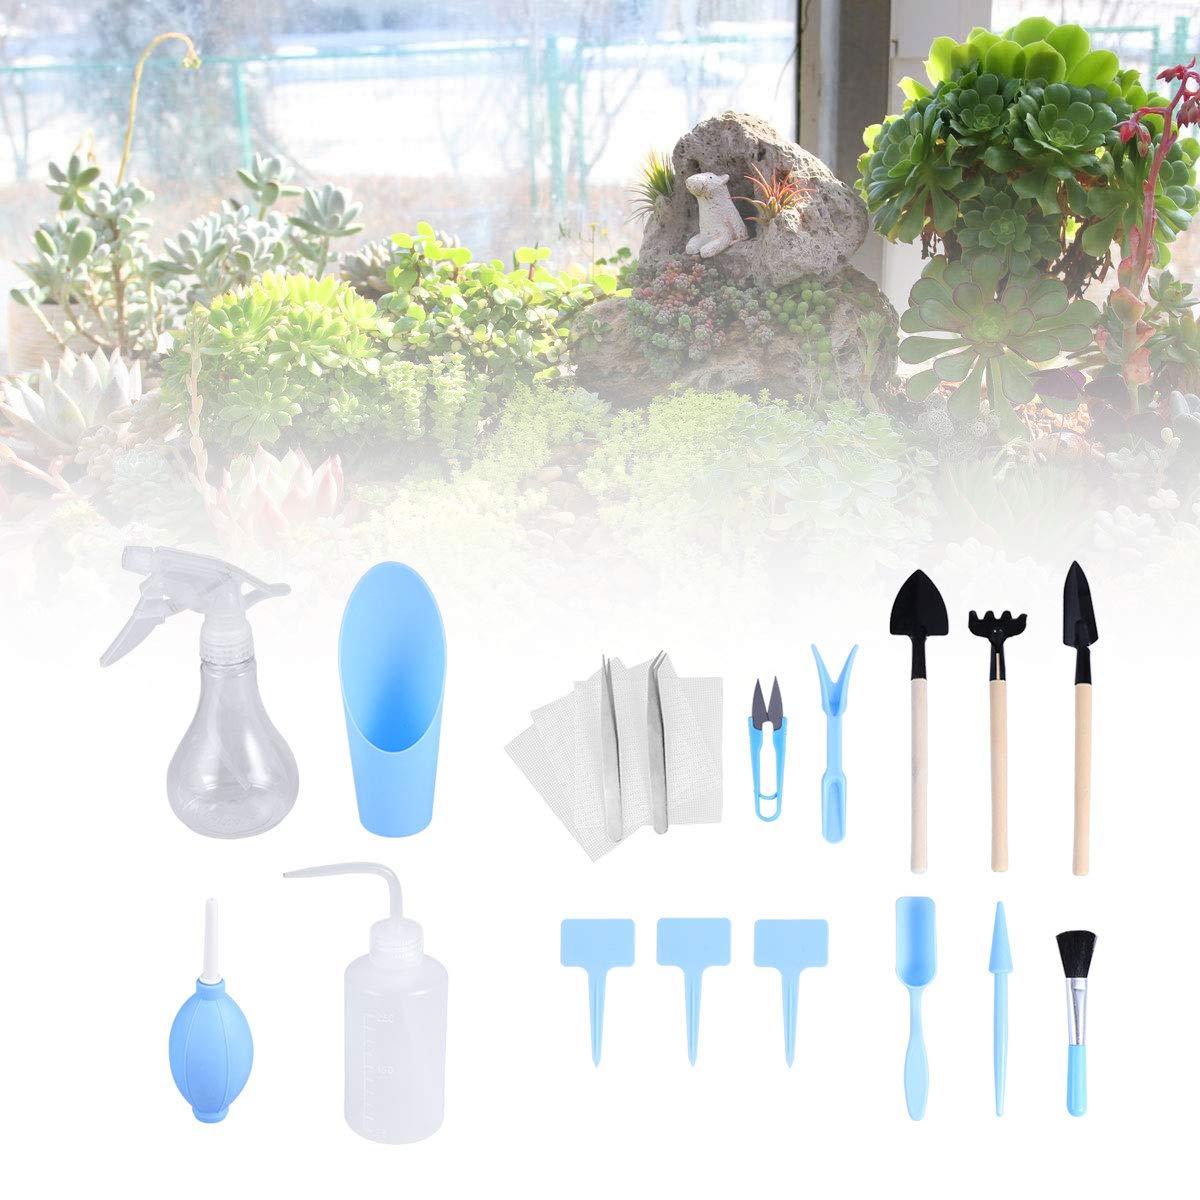 Set for Indoor Fairy Gard STOBOK 16pcs Mini Garden Hand Transplanting Succulent Tools Miniature Planting